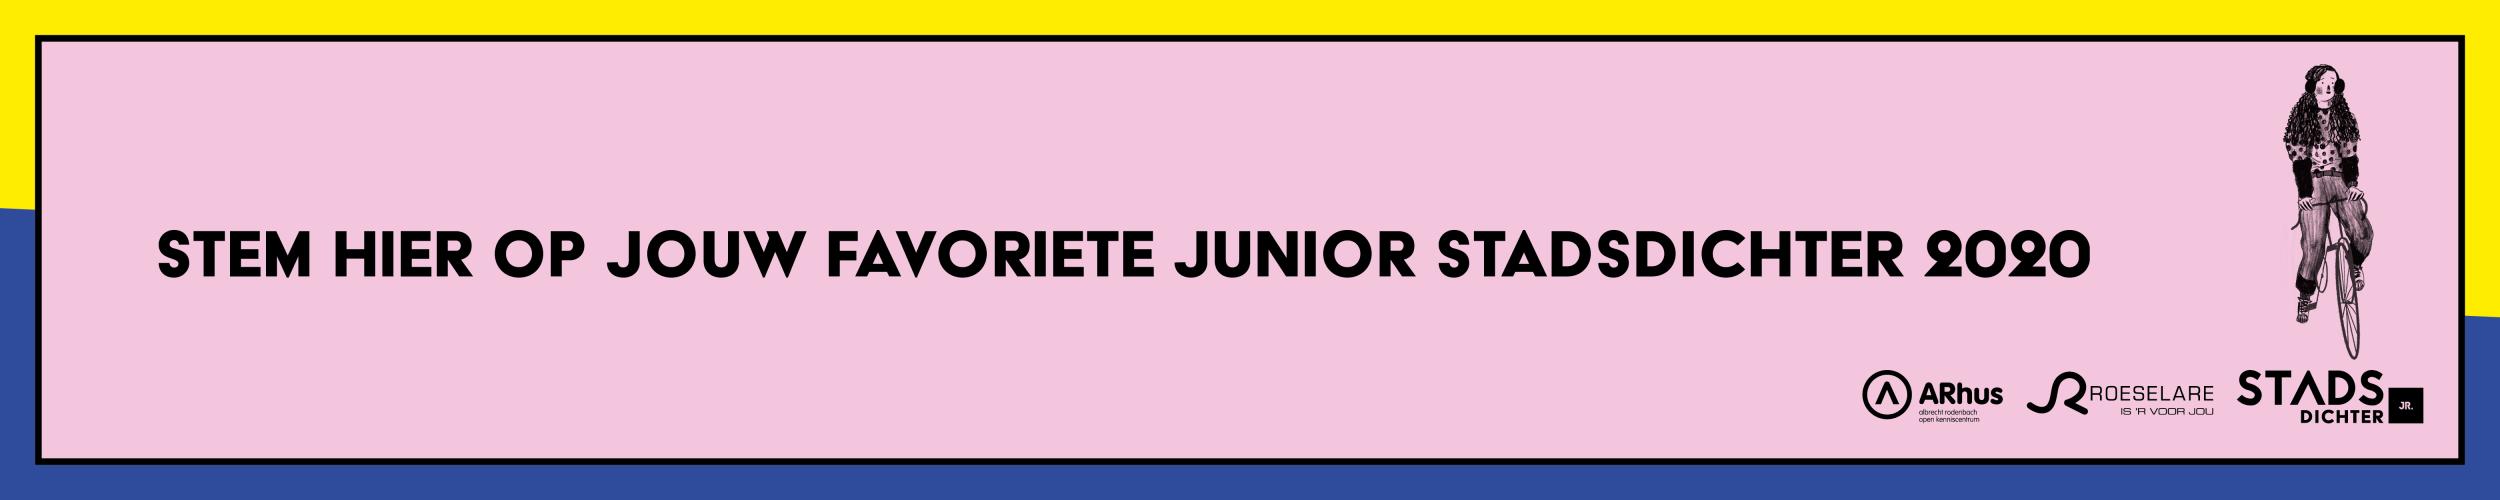 Stem op je favoriete Junior Stadsdichter 2020